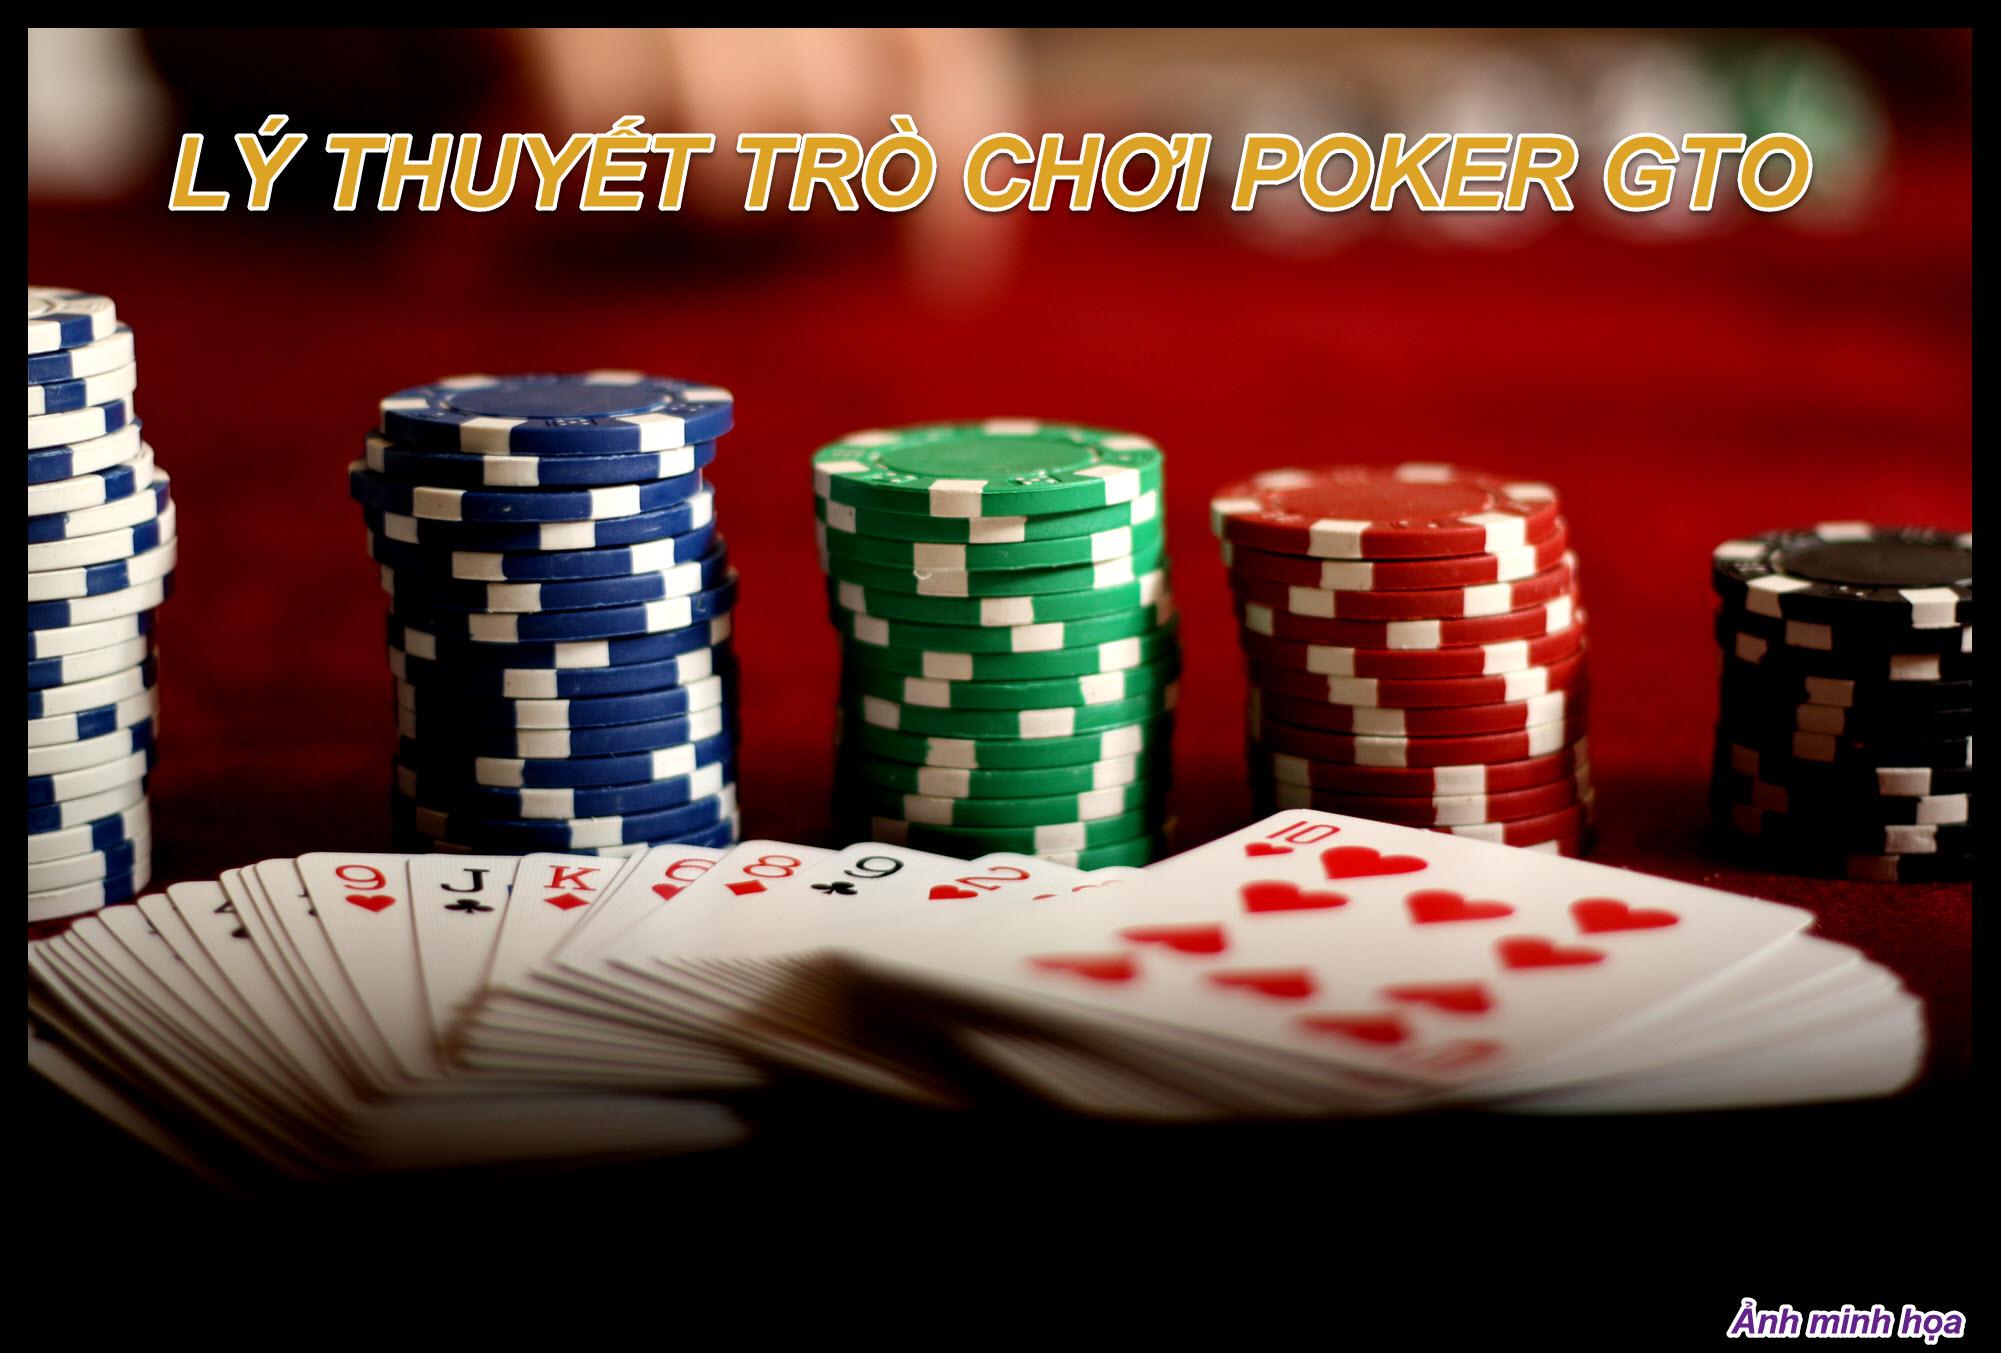 Ly thuyet tro choi Poker GTO 01 ver01.jpg